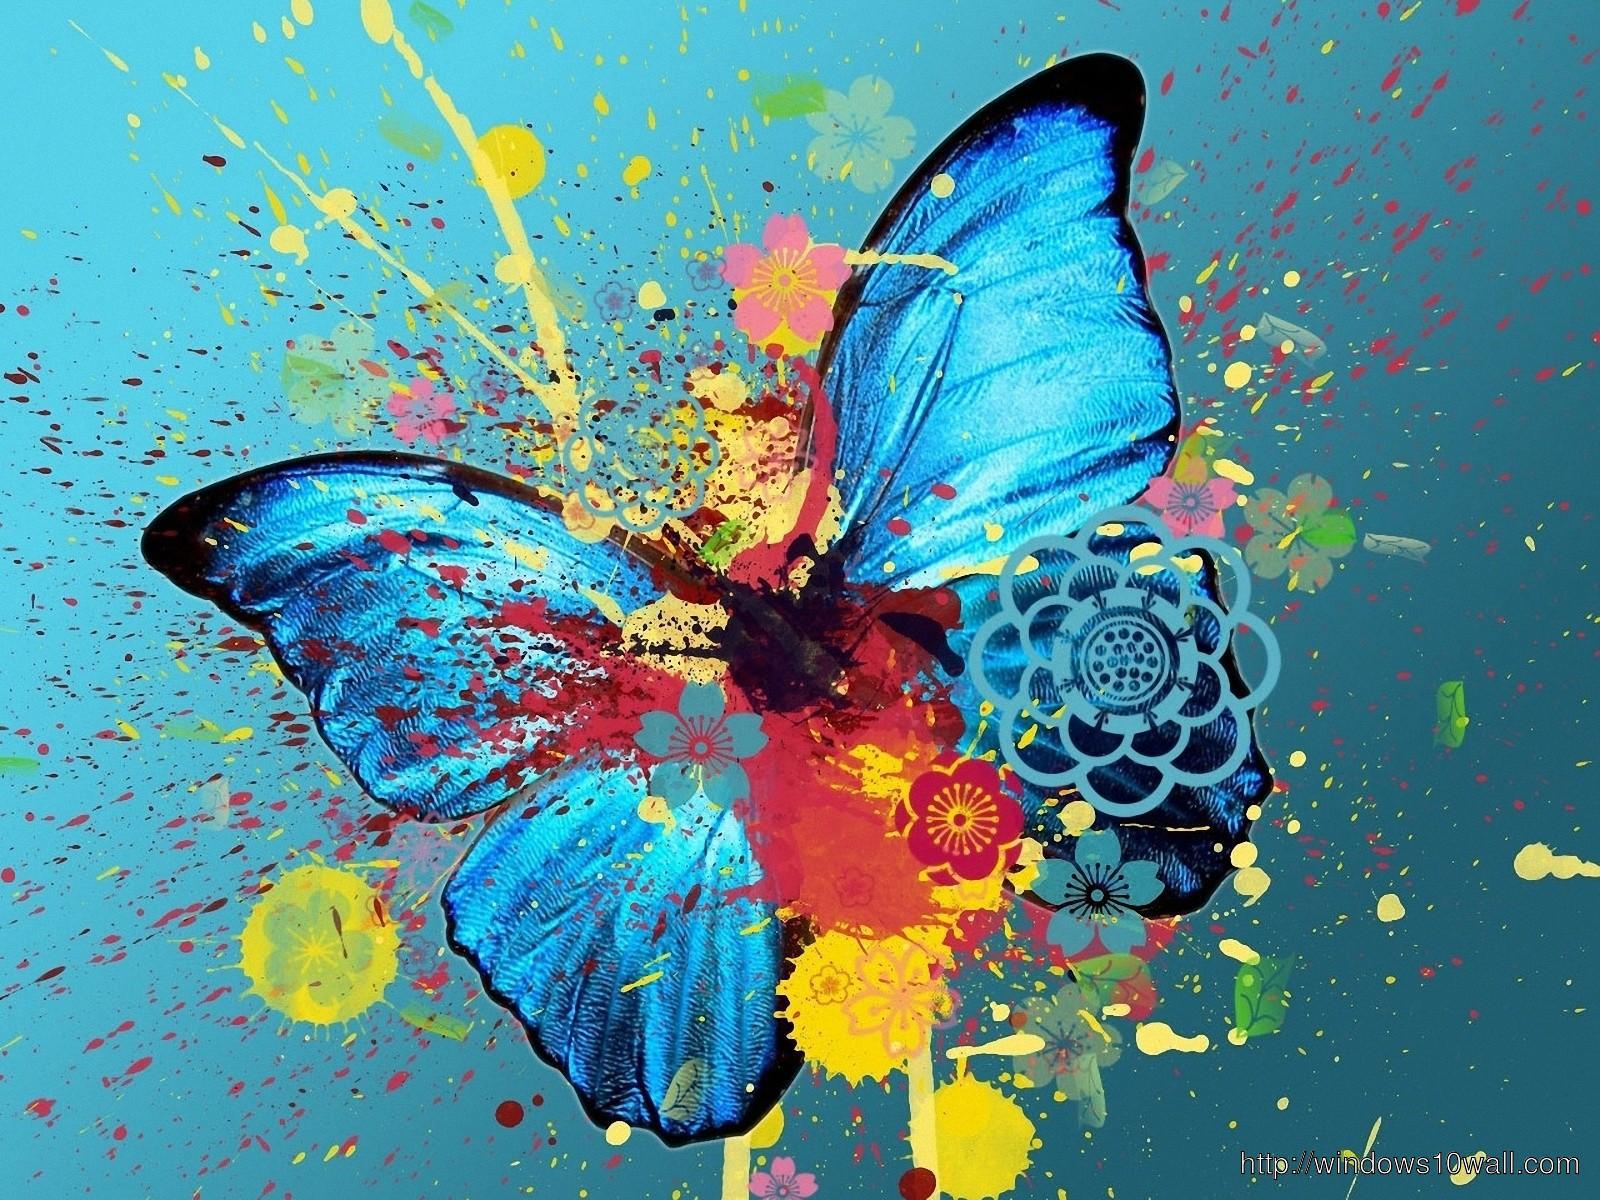 butterfly-wallpaper-dowload